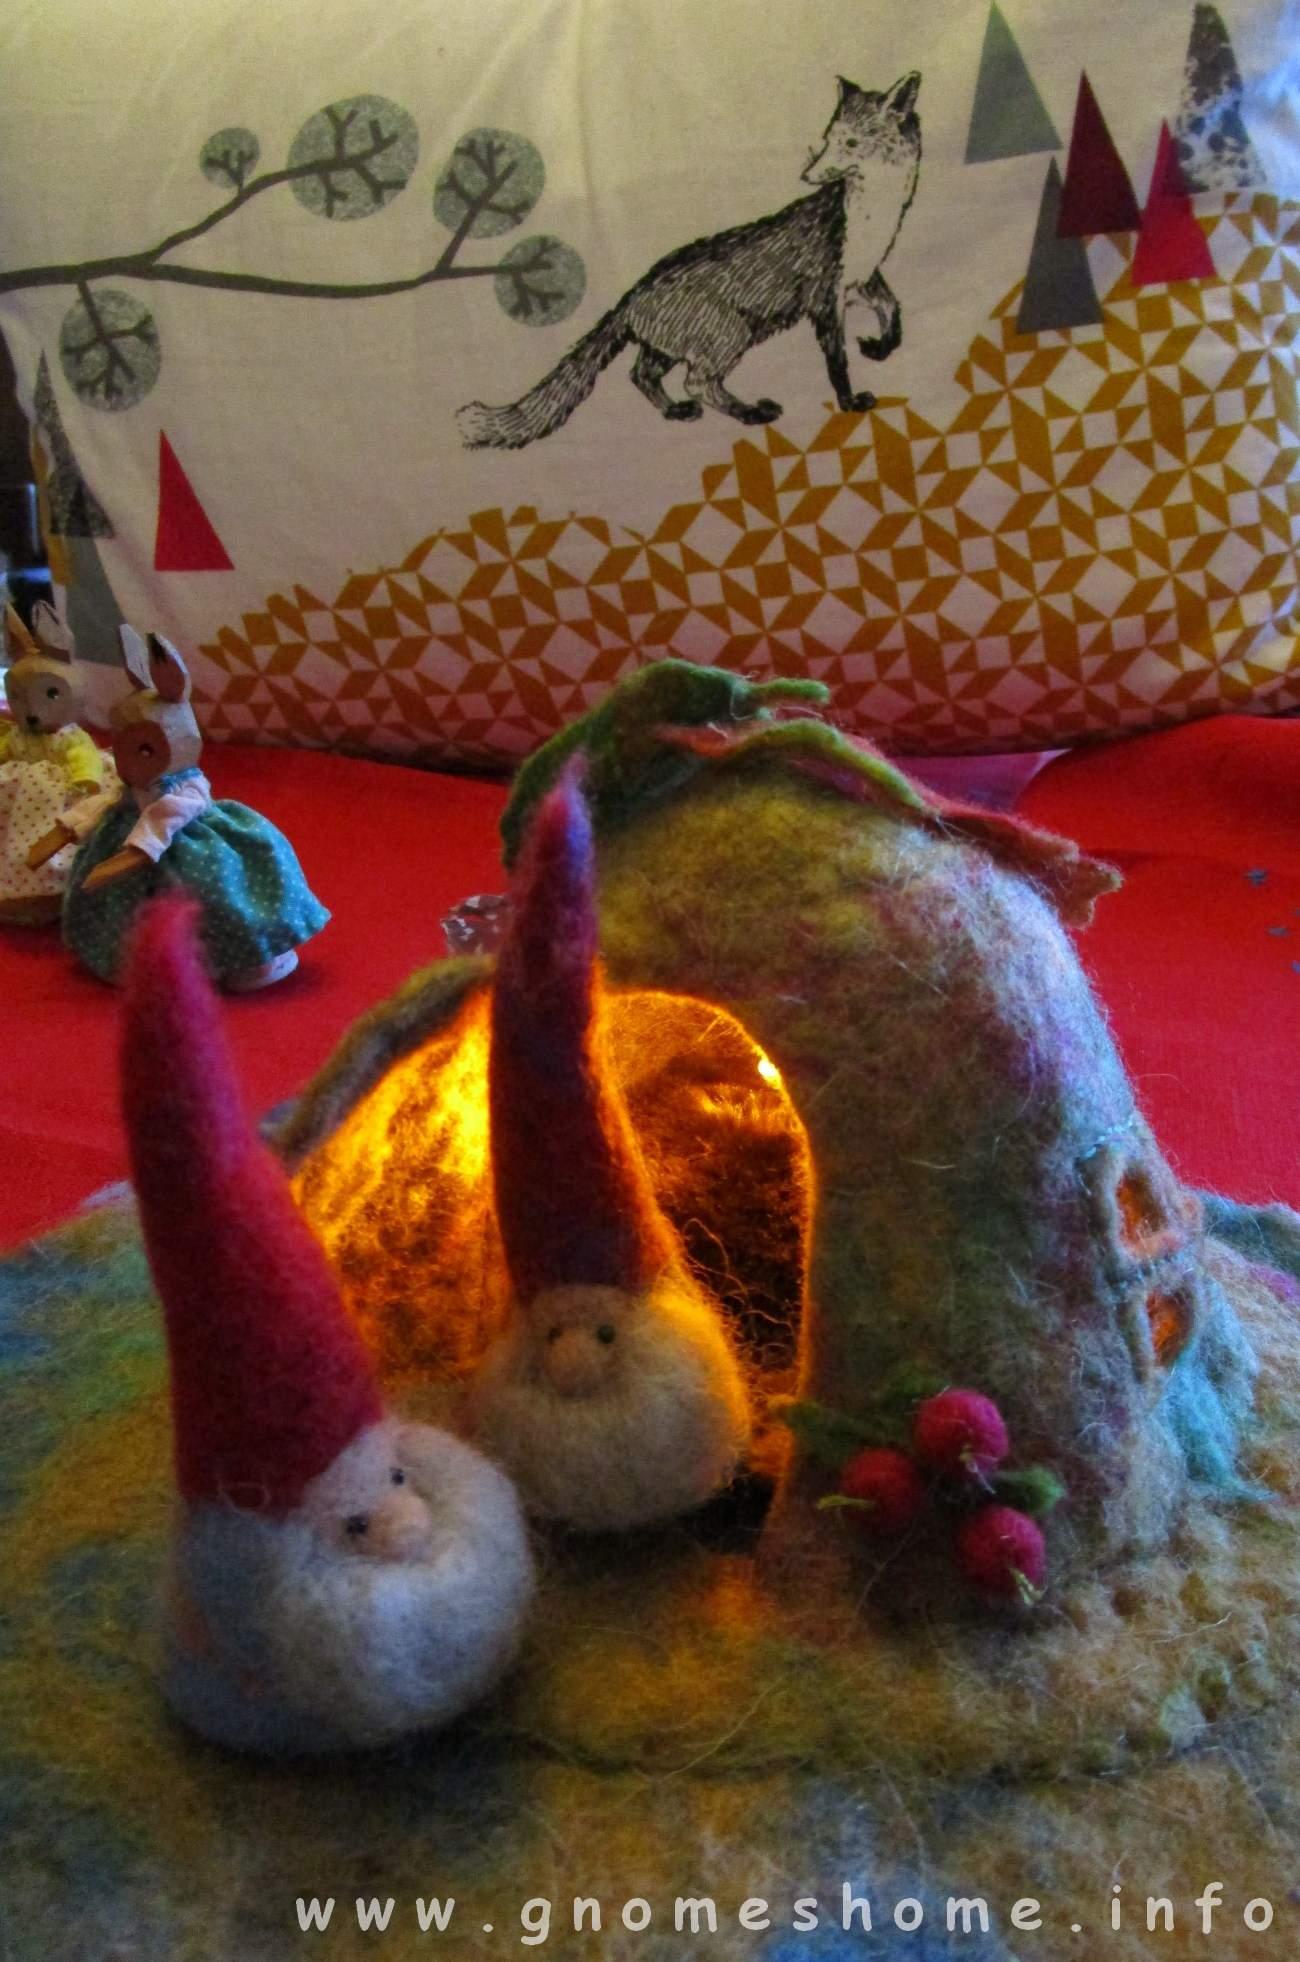 gnomeshome 3